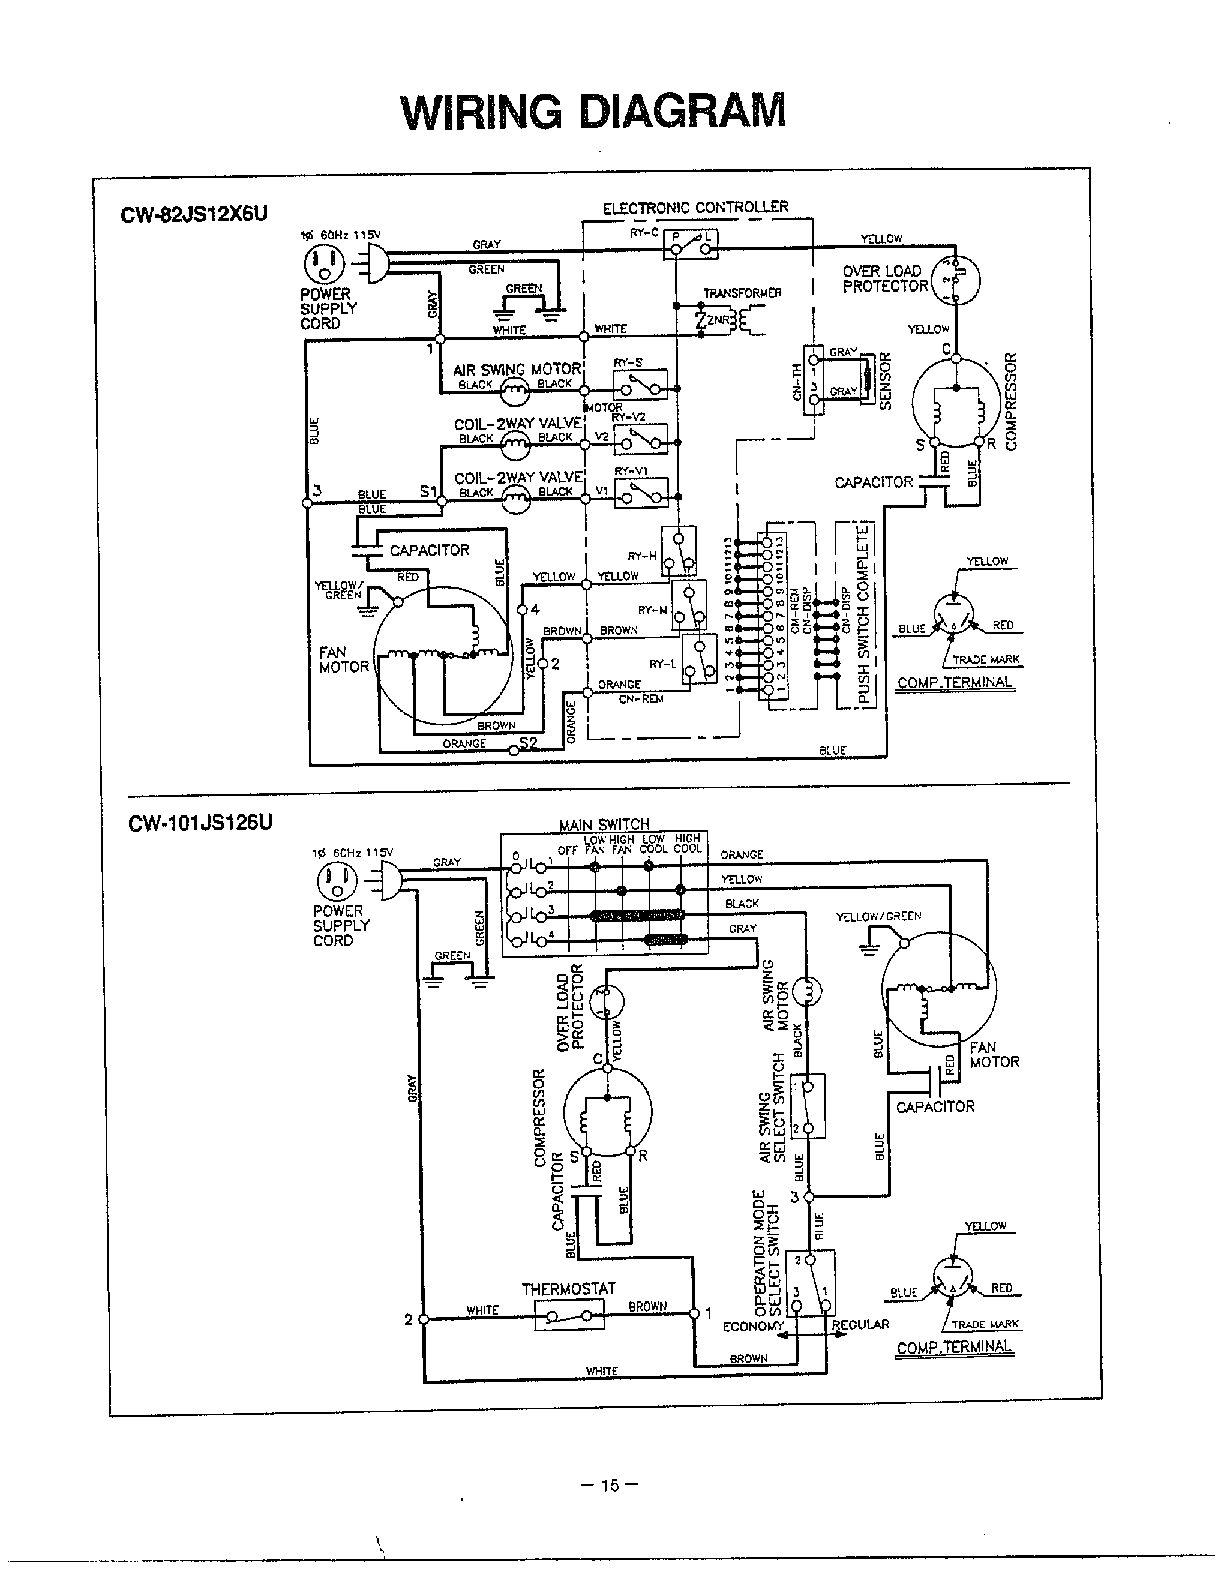 Daikin Aircon Wiring Diagram Auto Electrical Peugeot 307 Light